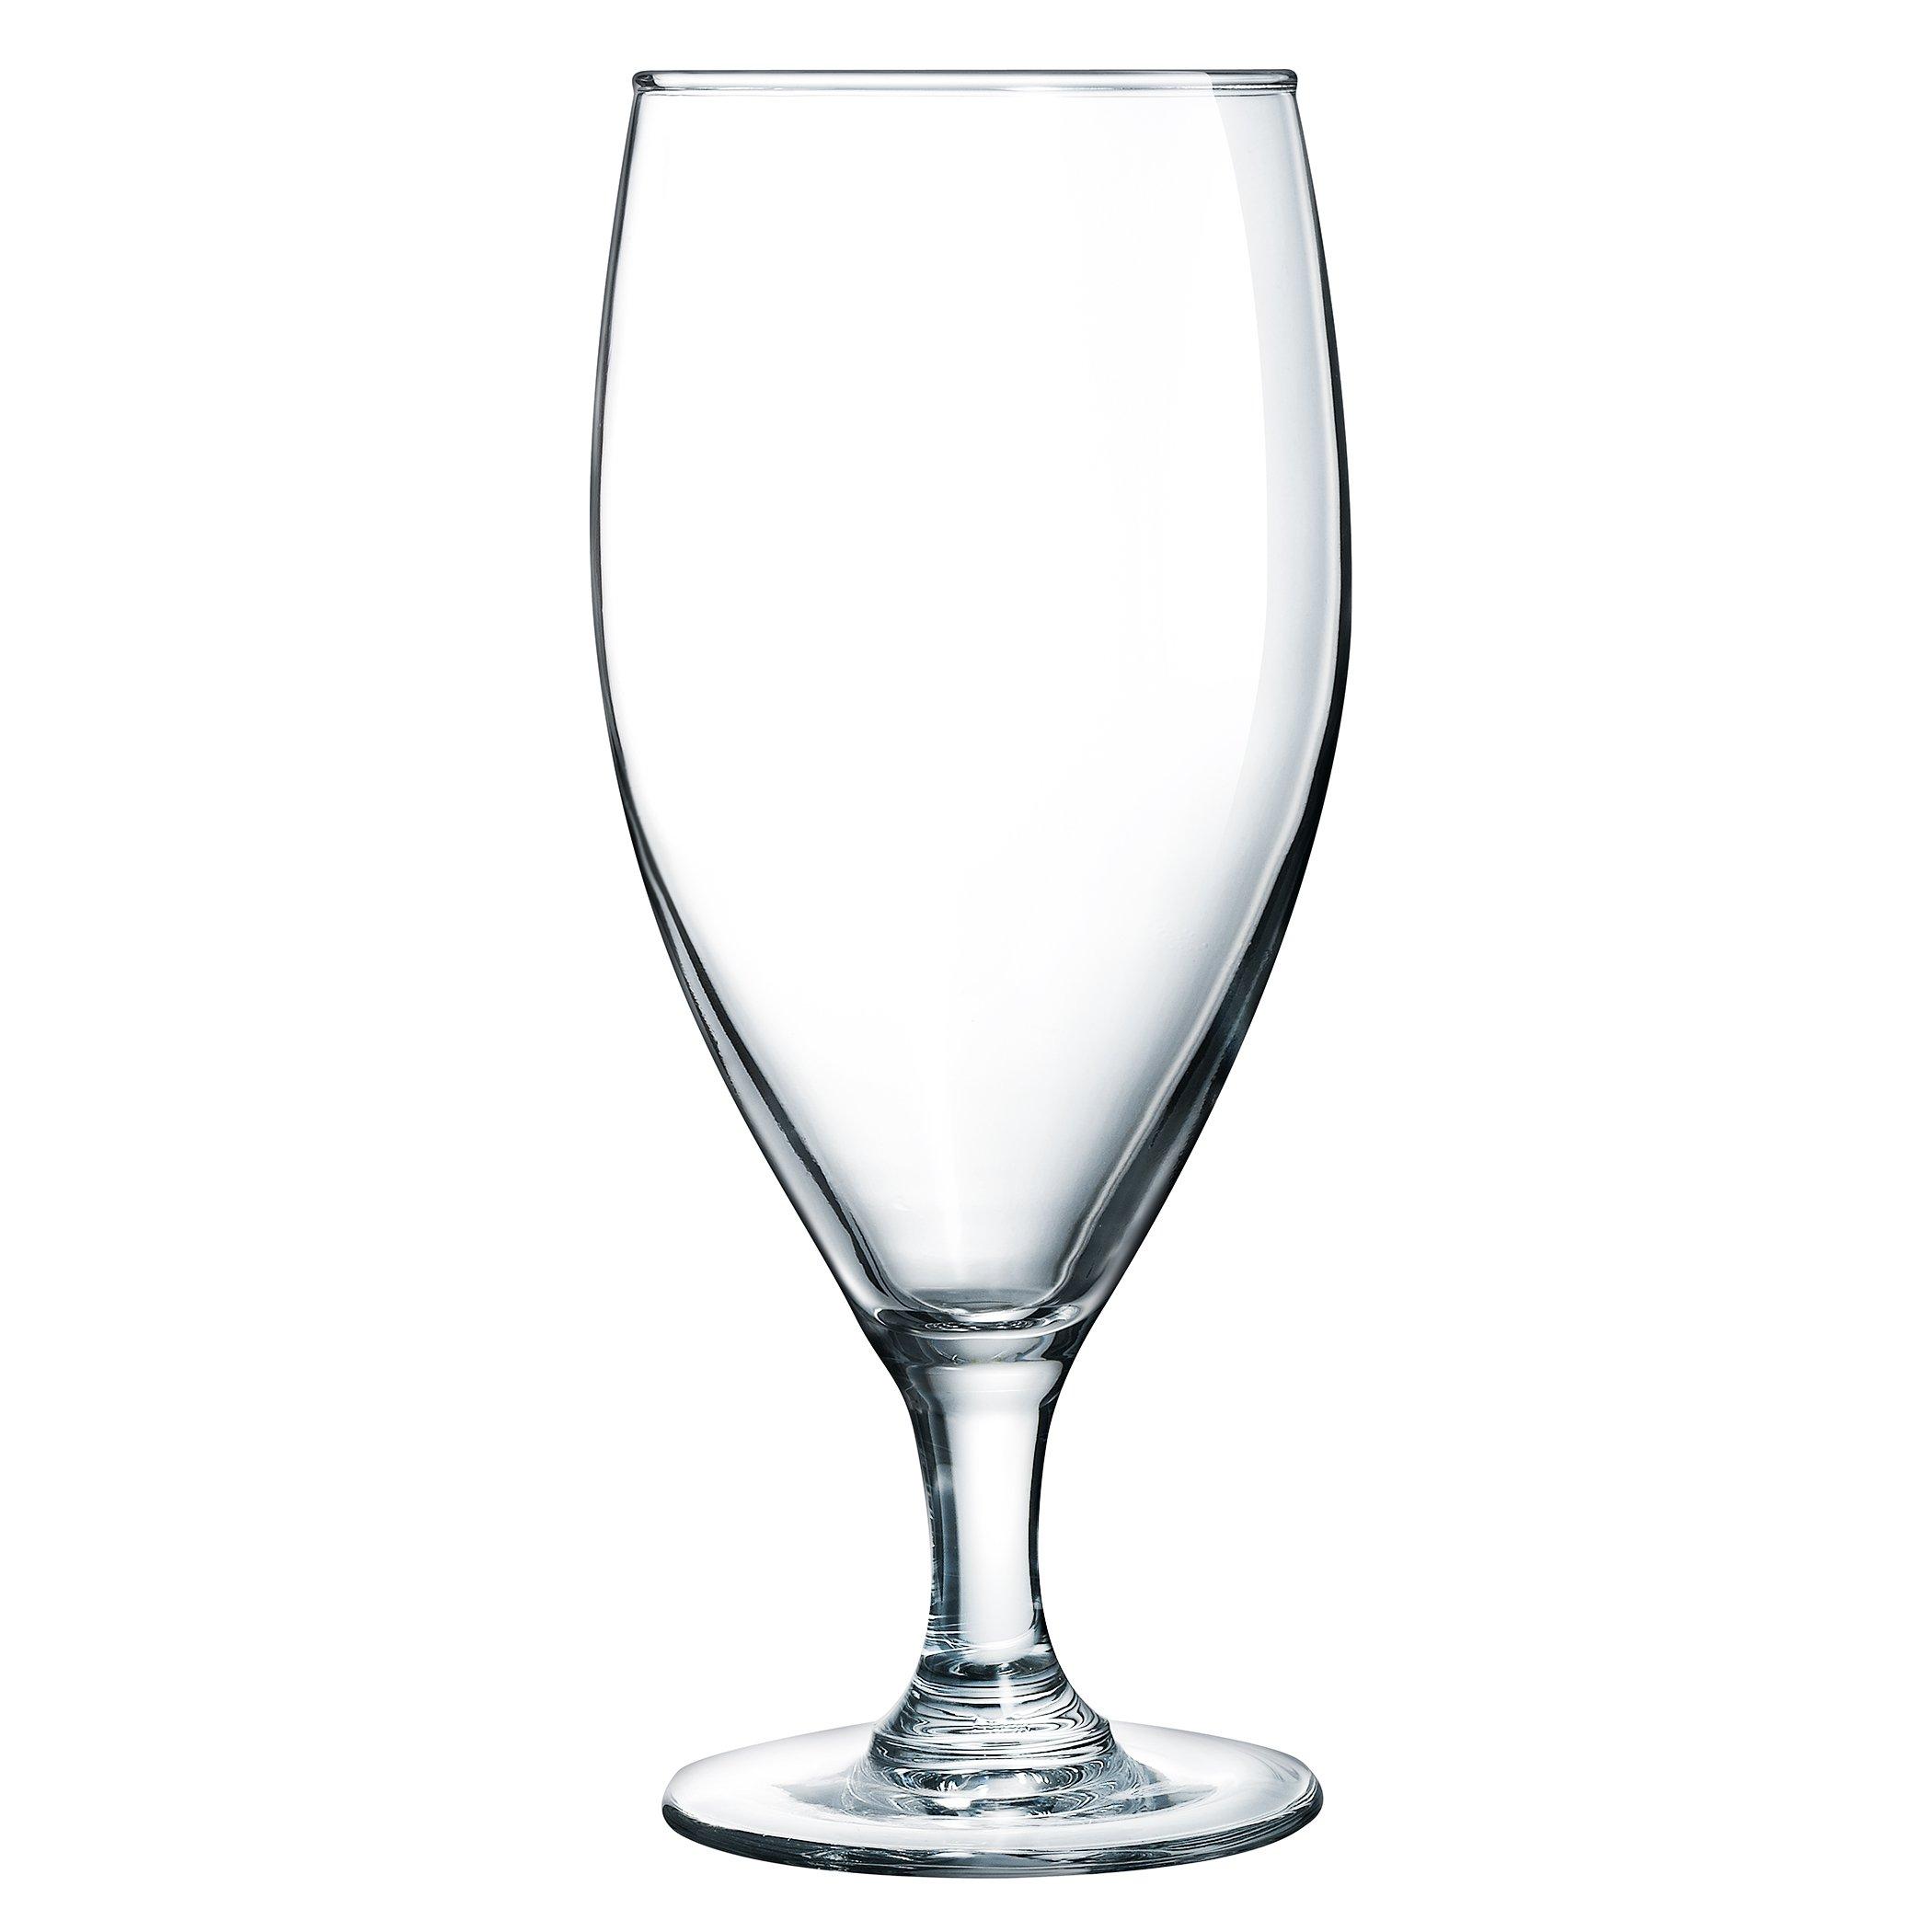 Luminarc ARC International Atlas Iced Beverage (Set of 4), 16.5 oz, Clear